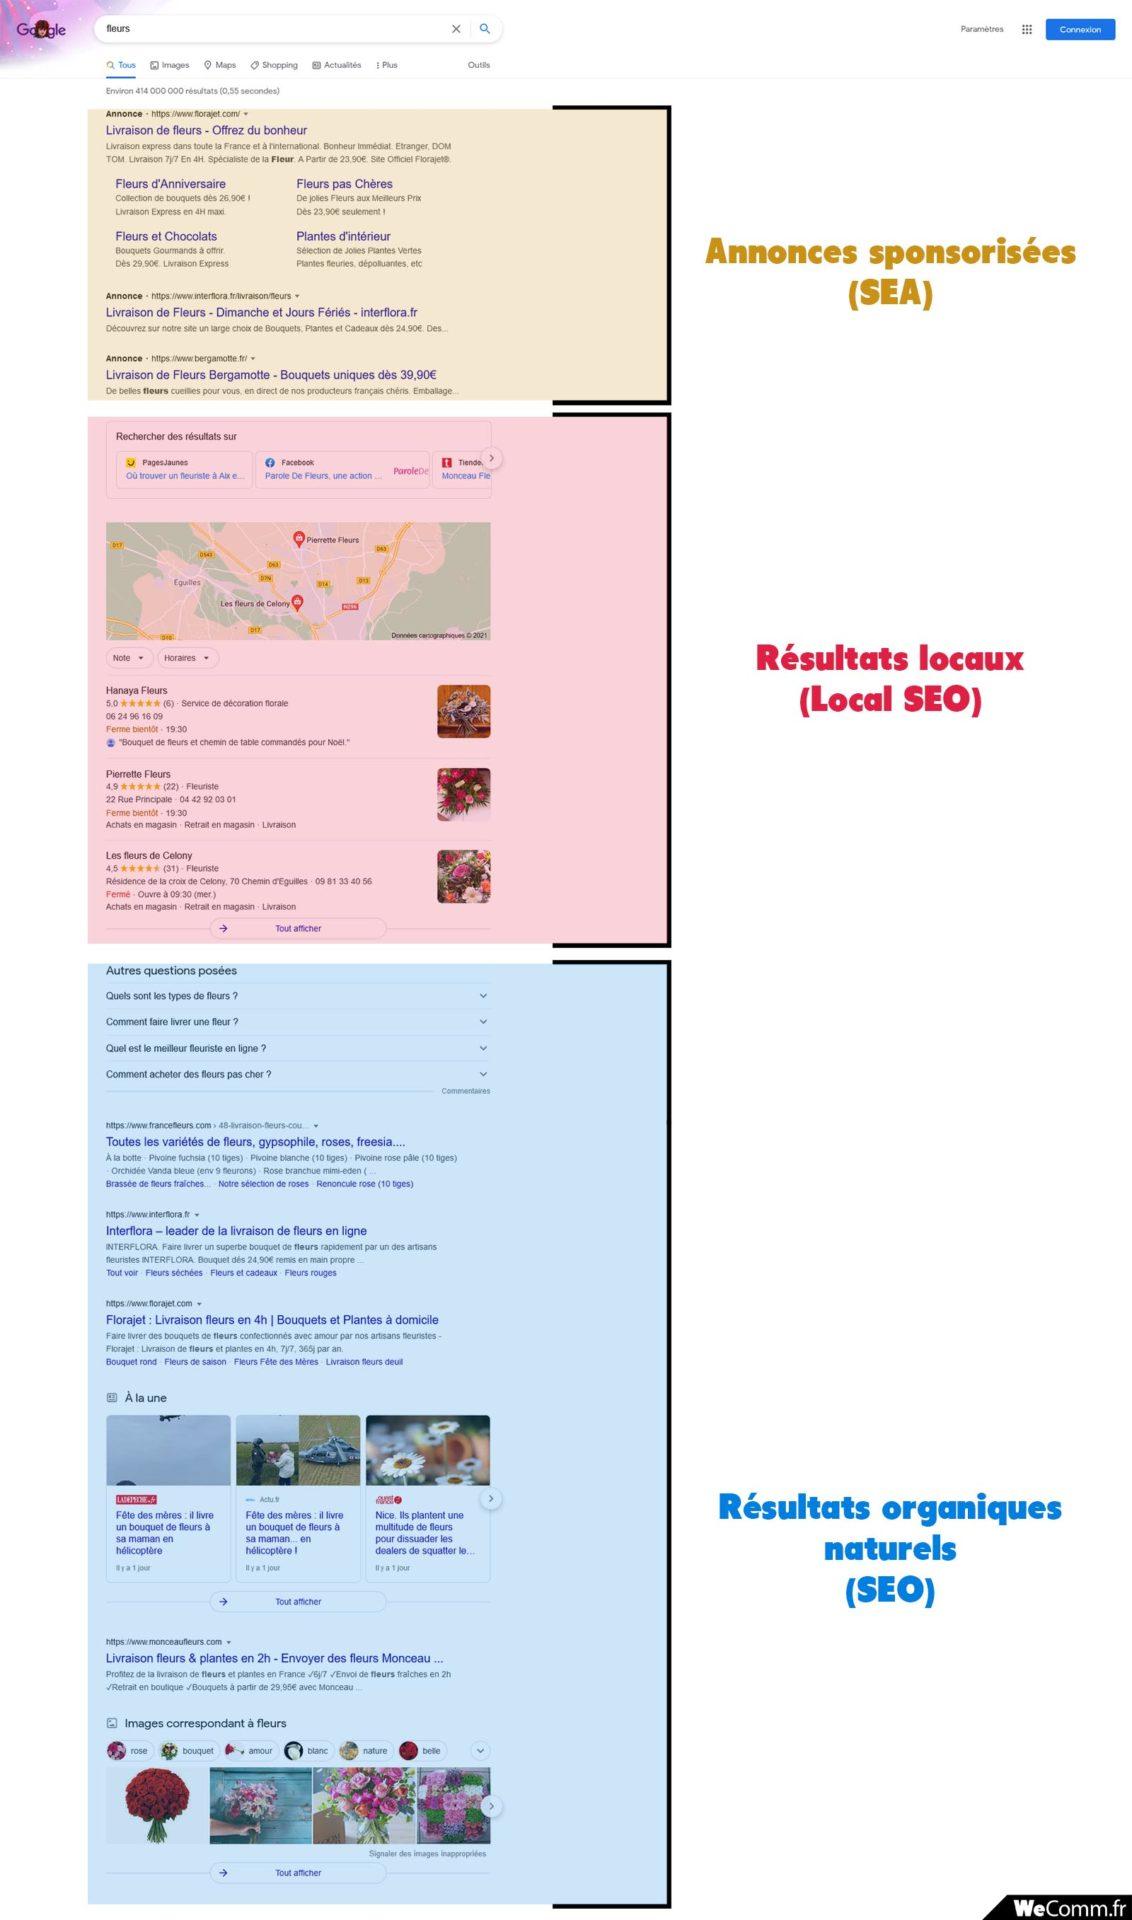 Résultats de recherche sea seo et local